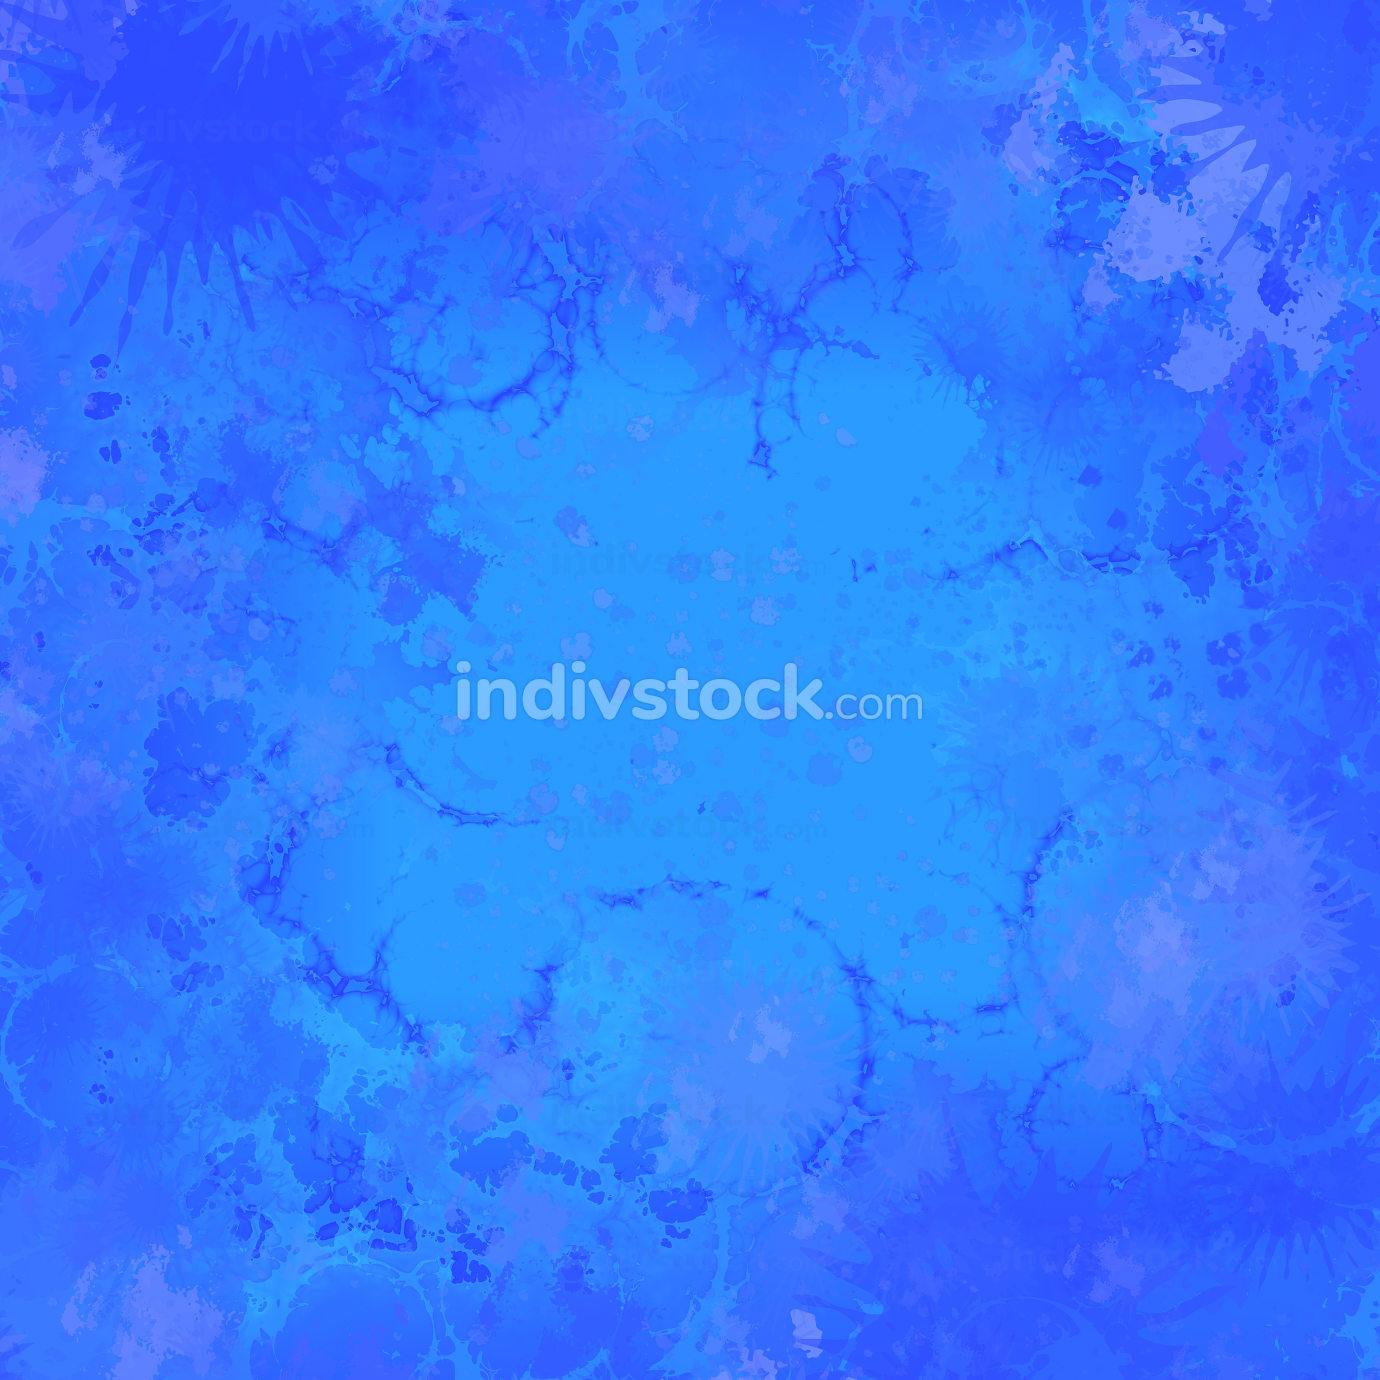 blue grunge splatter background